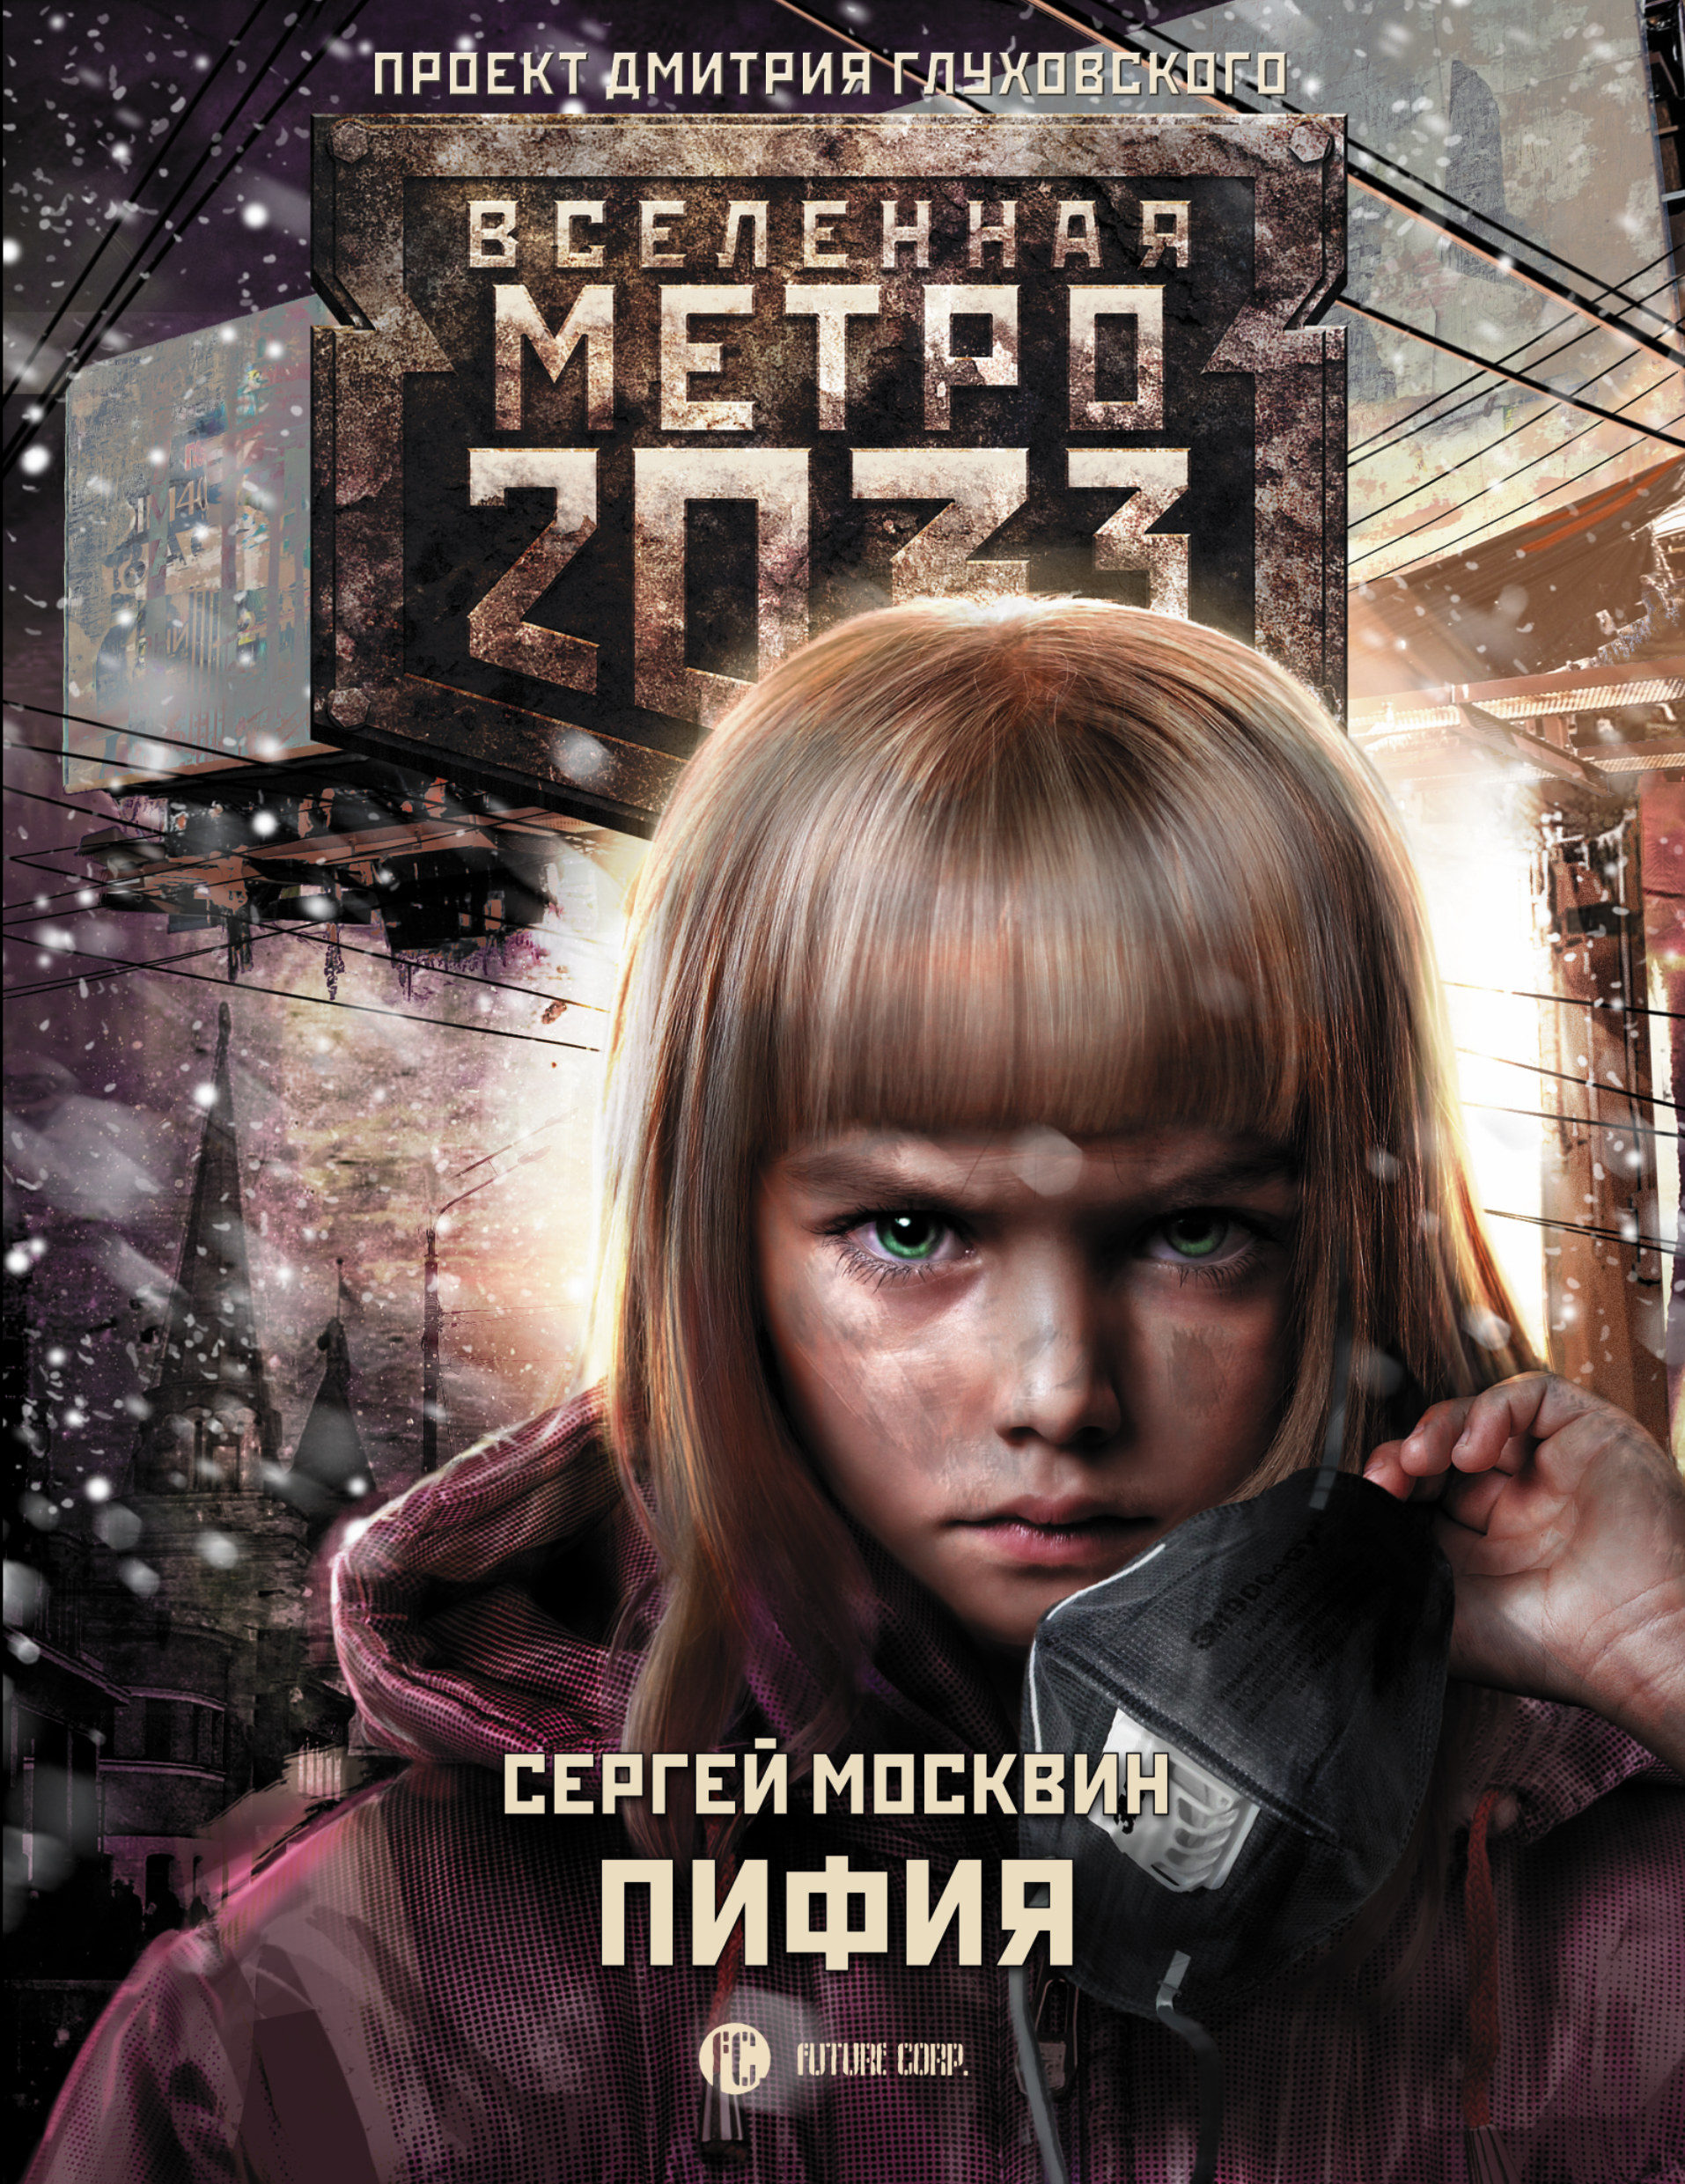 Москвин С.Л. Метро 2033: Пифия шабалов д метро 2033 право на жизнь